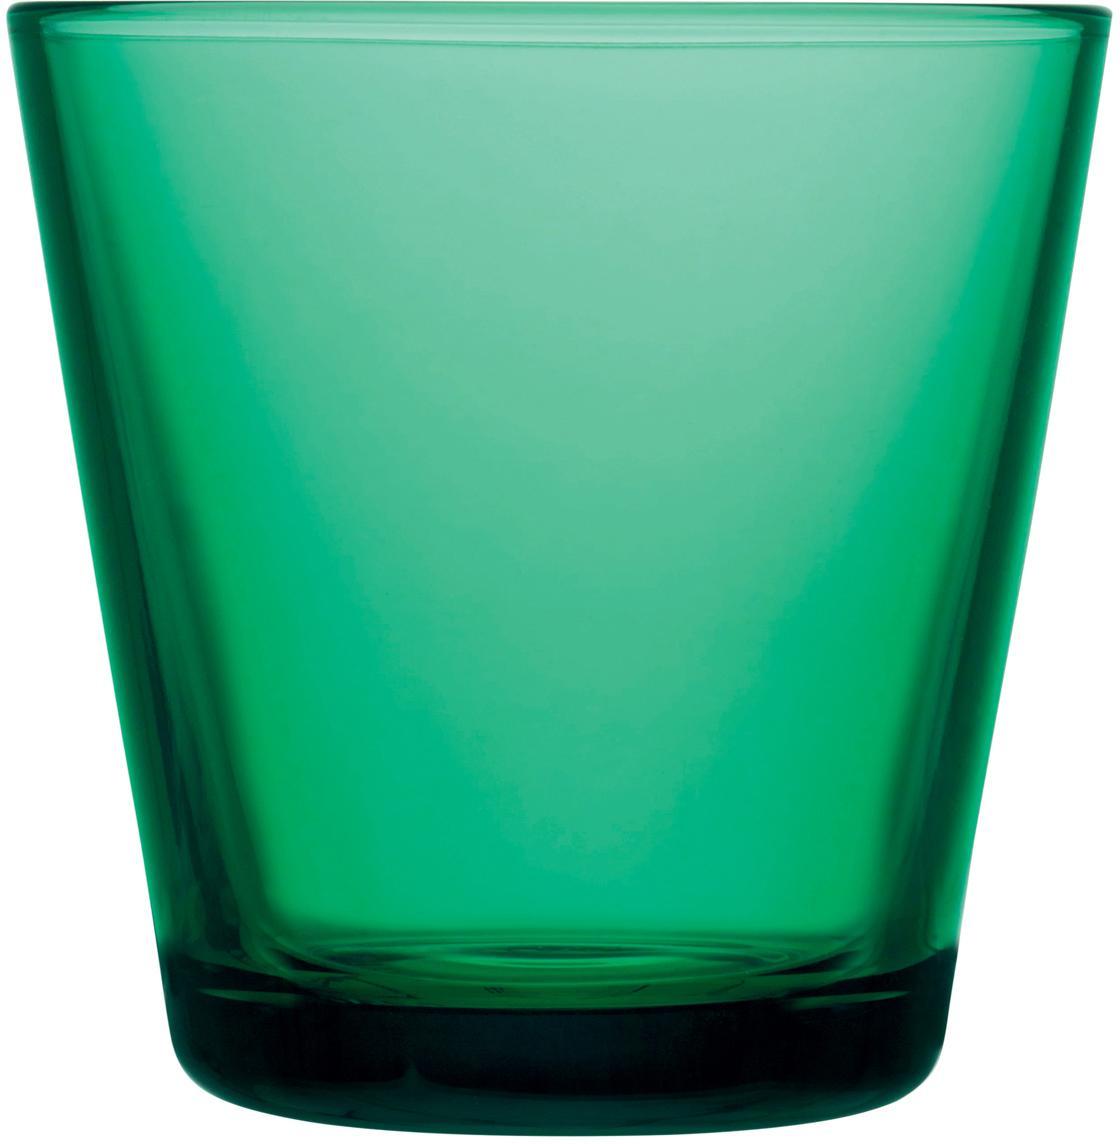 Waterglazen Kartio, 2 stuks, Glas, Smaragdgroen, Ø 8 x H 8 cm